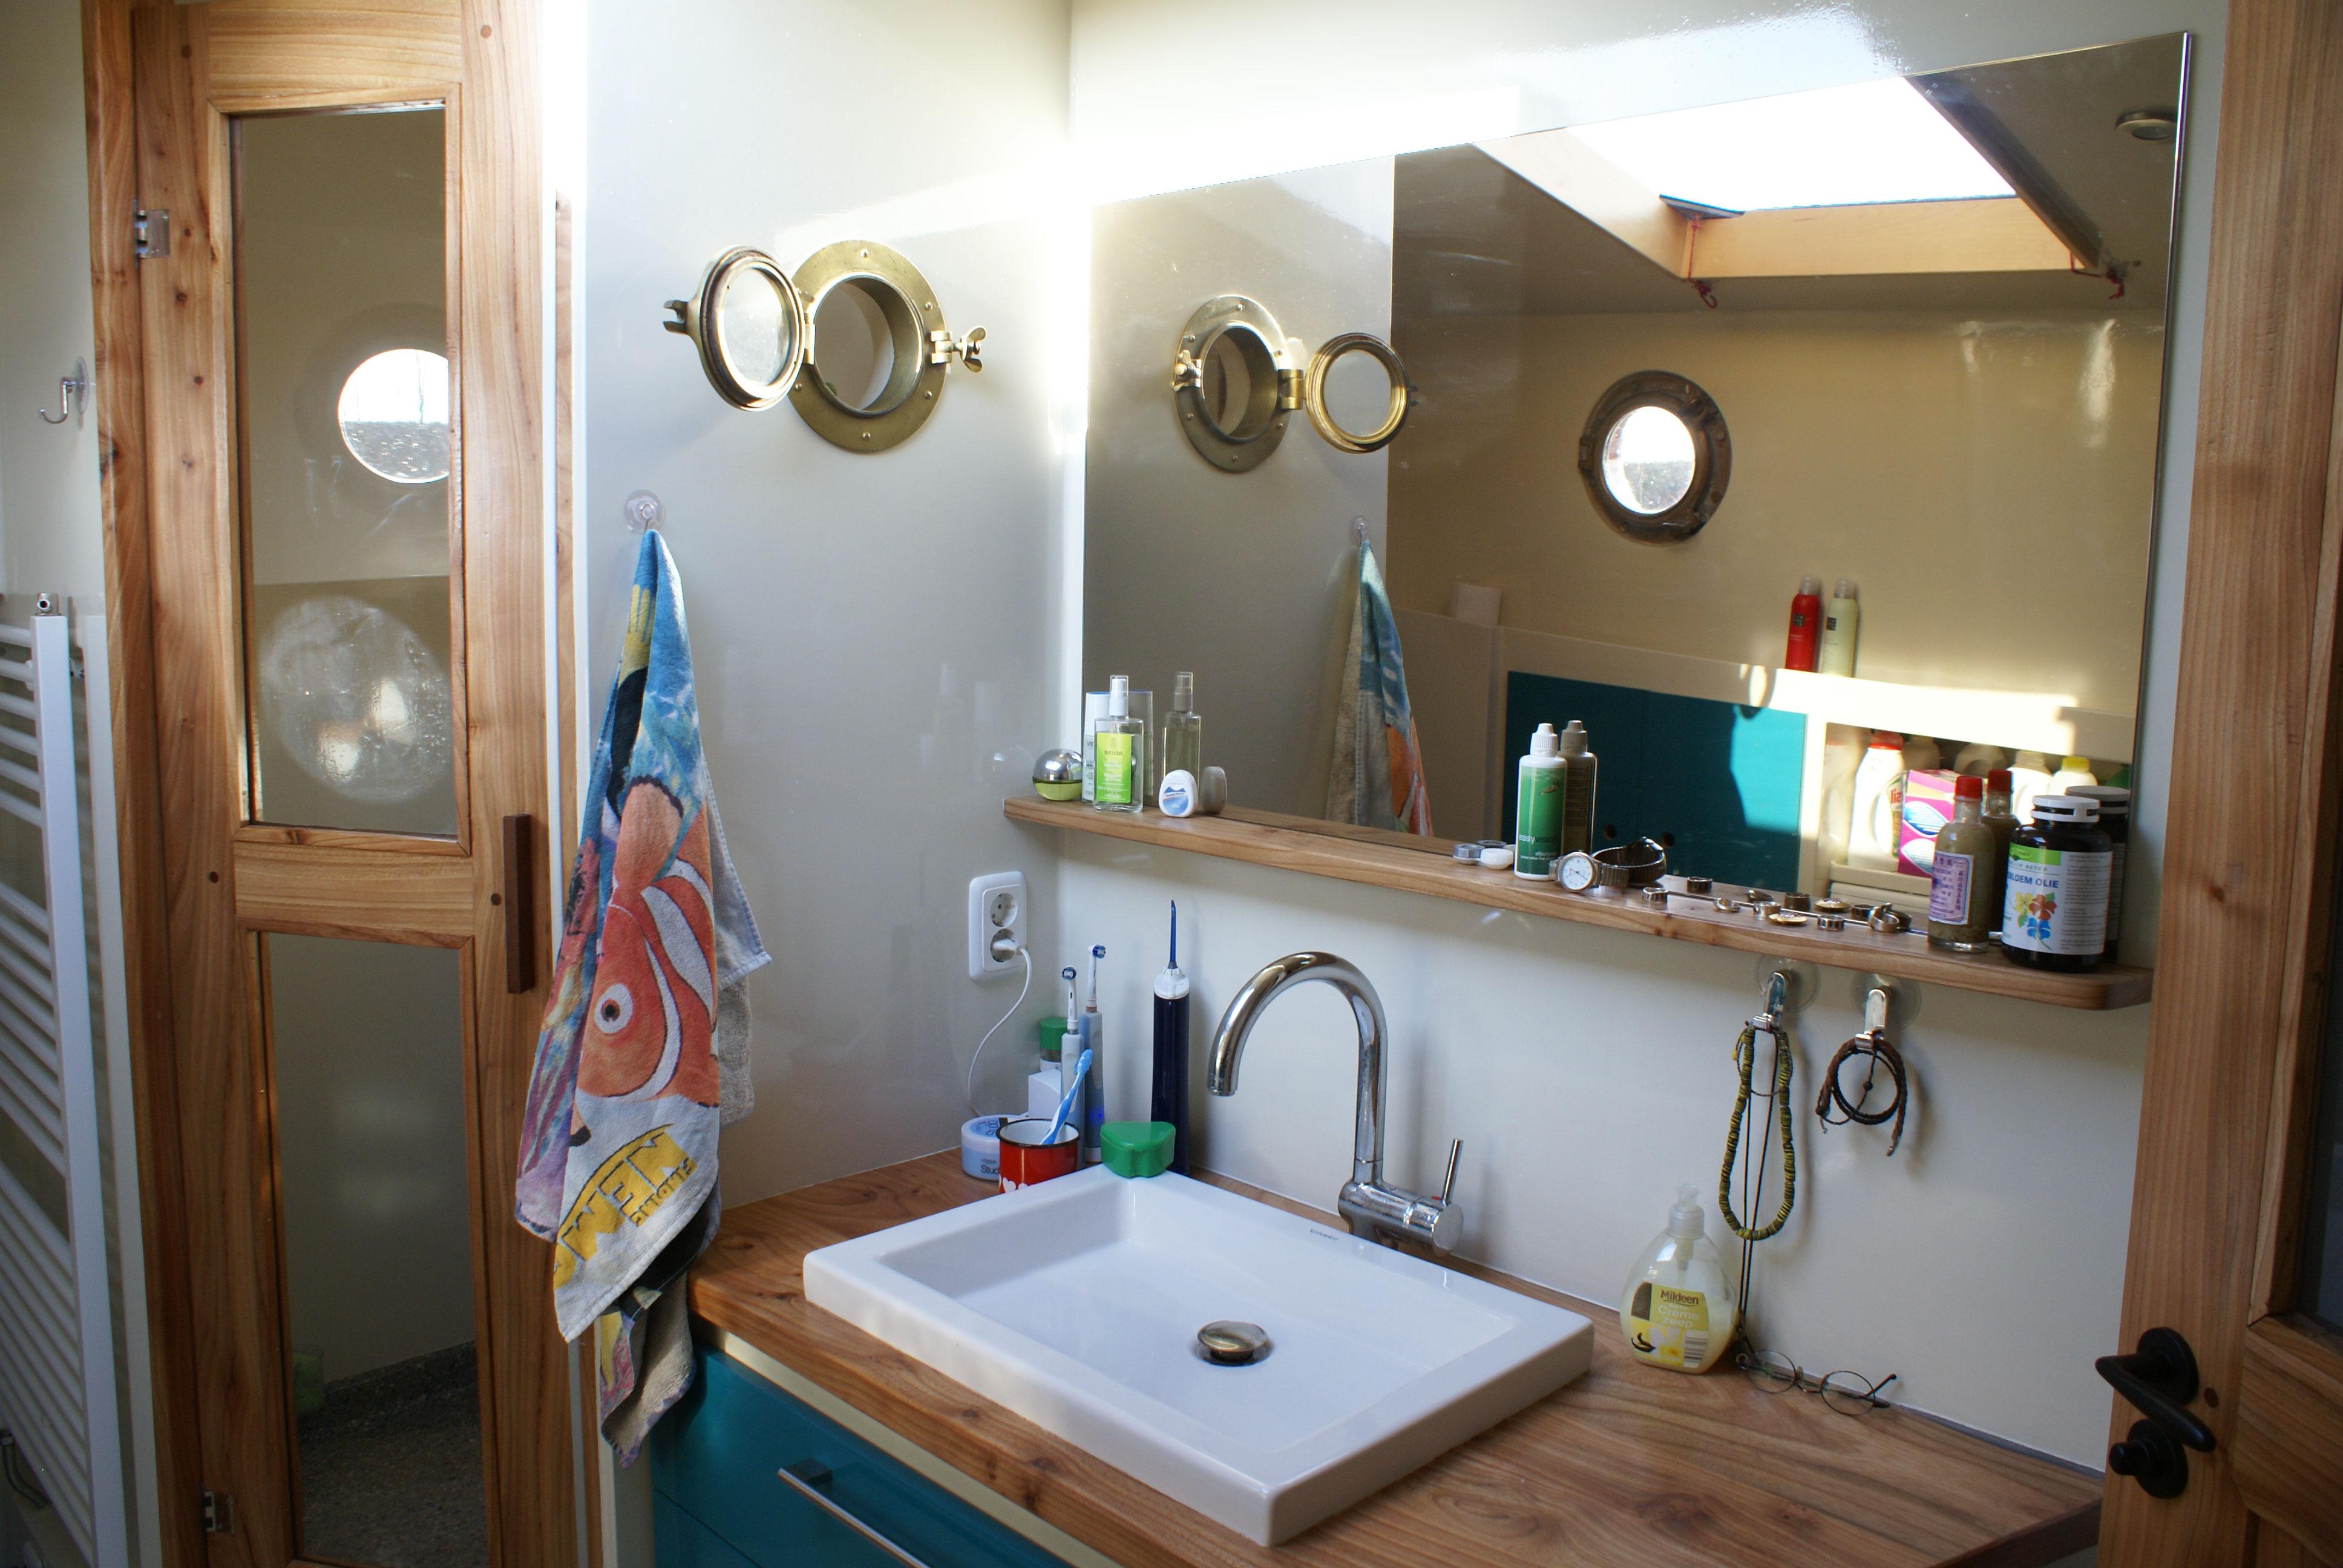 Badkamer epoxy badkamer ontwerp idee n voor uw huis samen met meubels die het - Badkamer desi ...